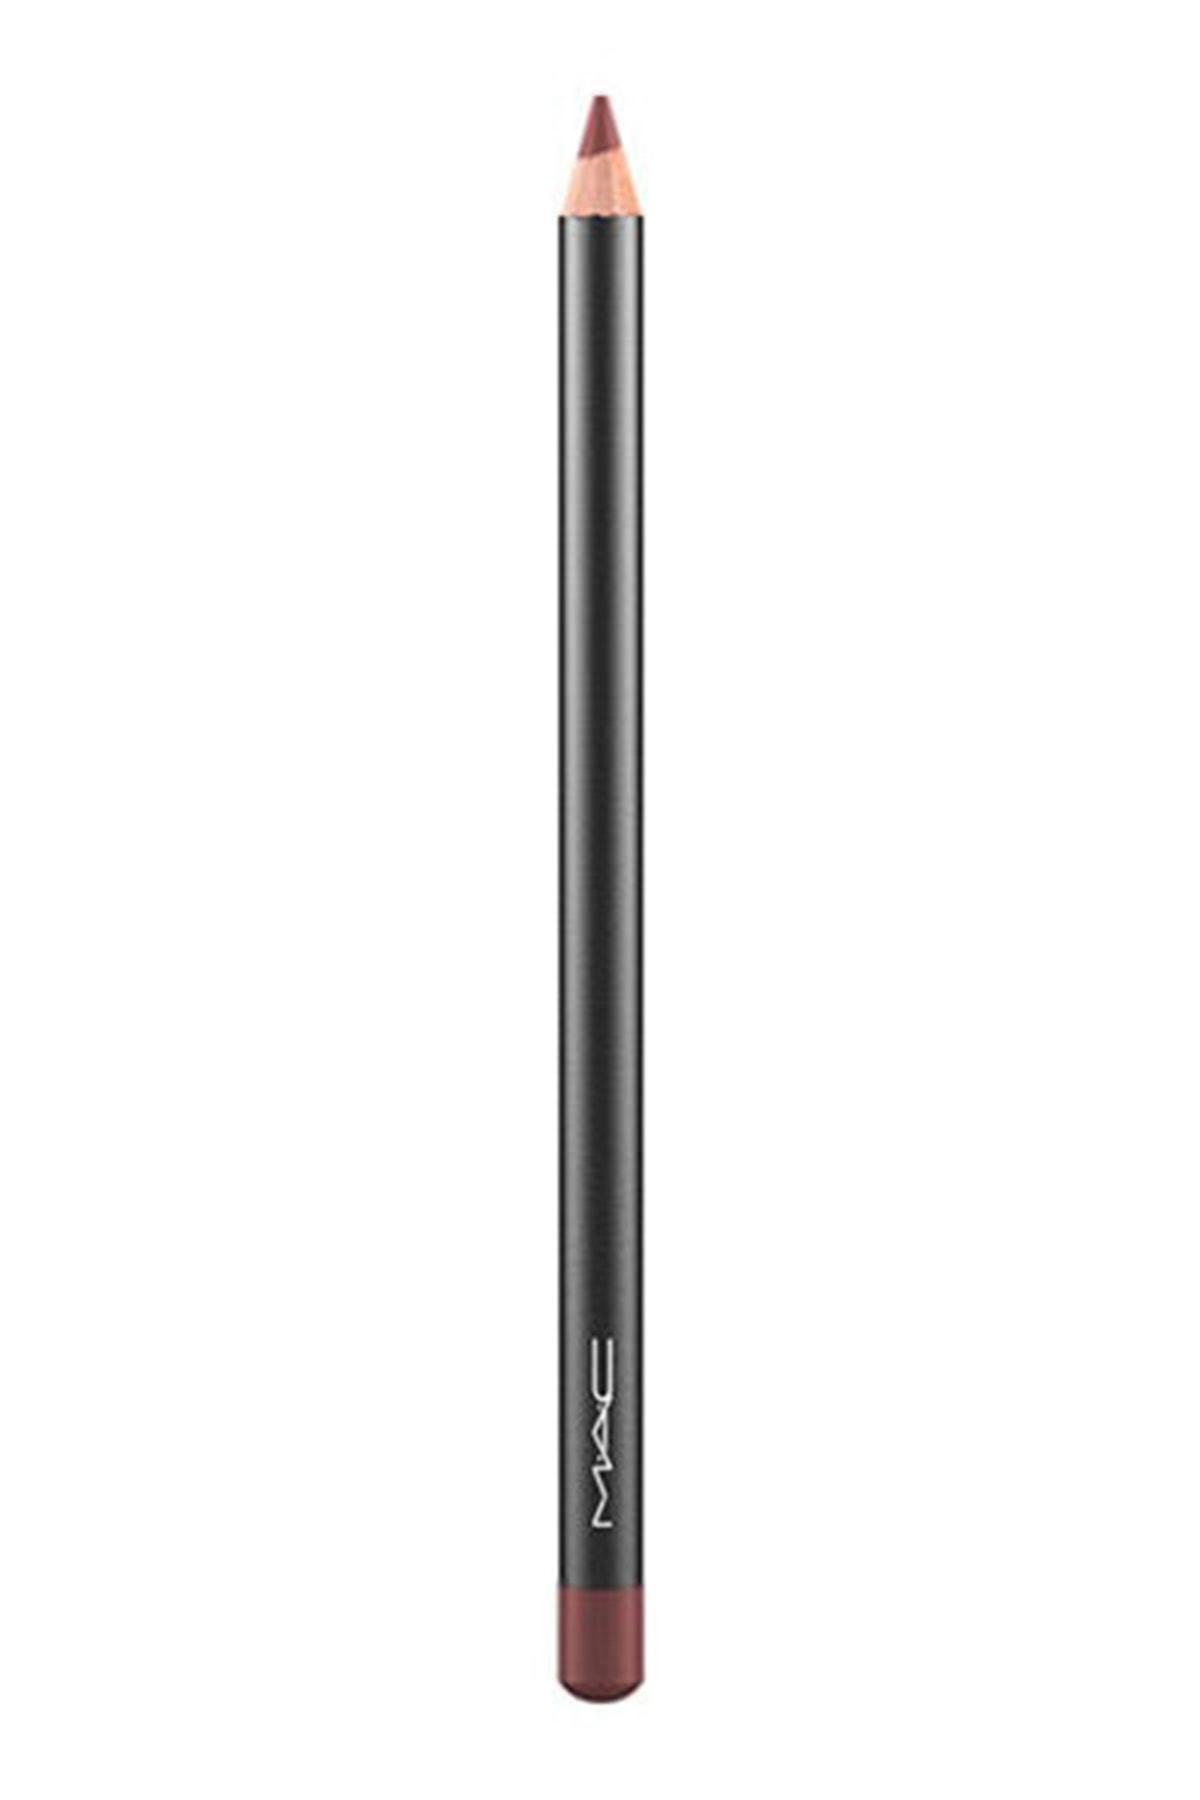 Dudak Kalemi - Lip Pencil Mahogany 1.45 g 773602430062